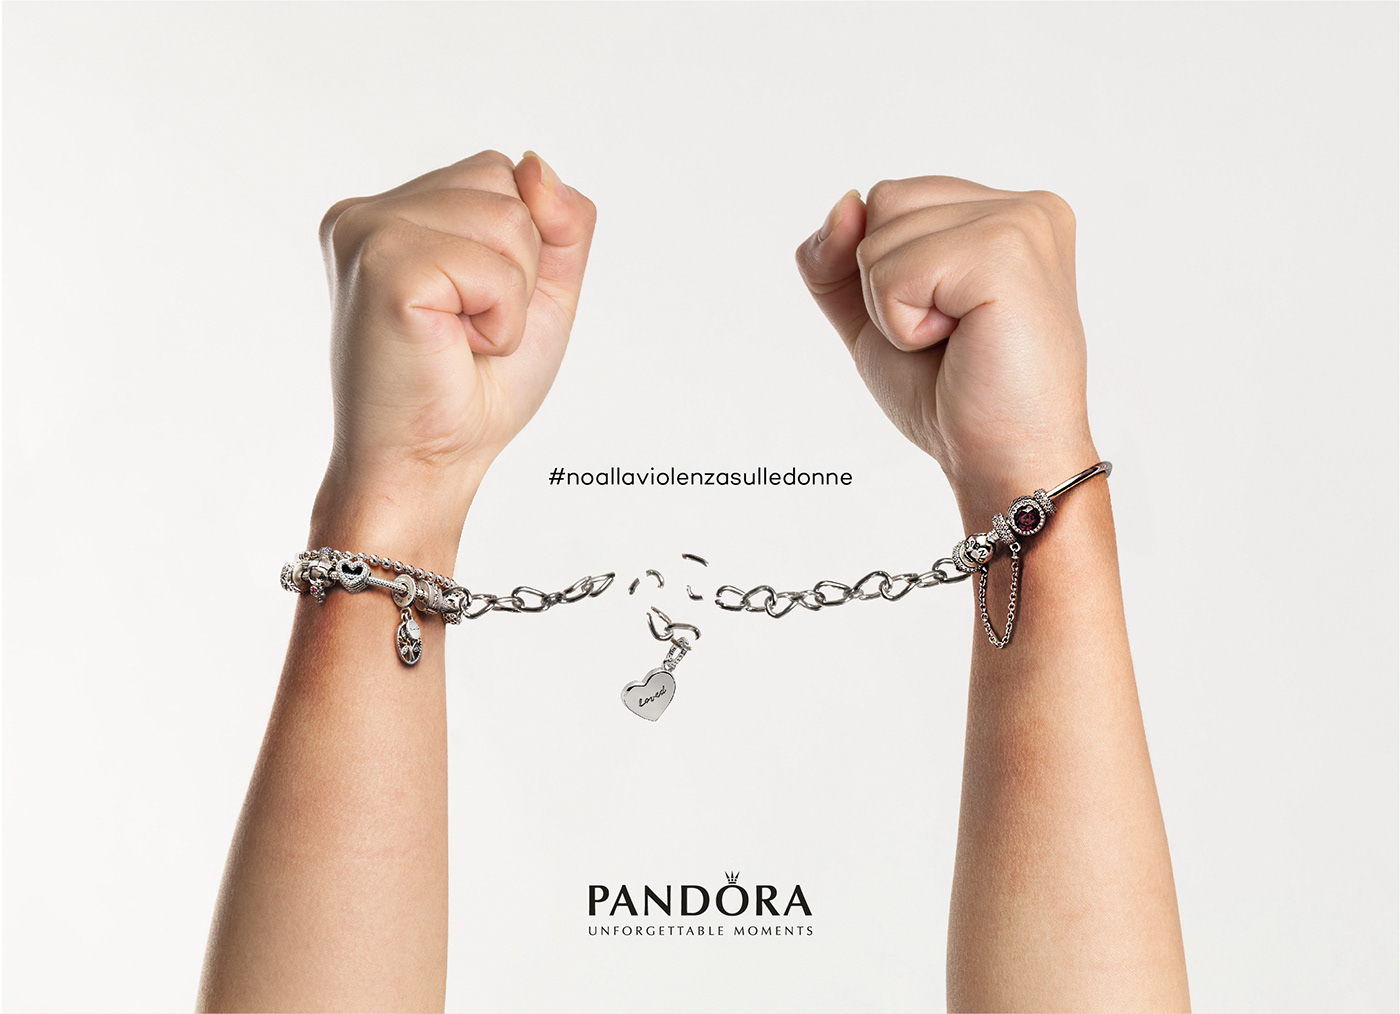 Advertising  pandora pink pubblicita violenza sulle donne